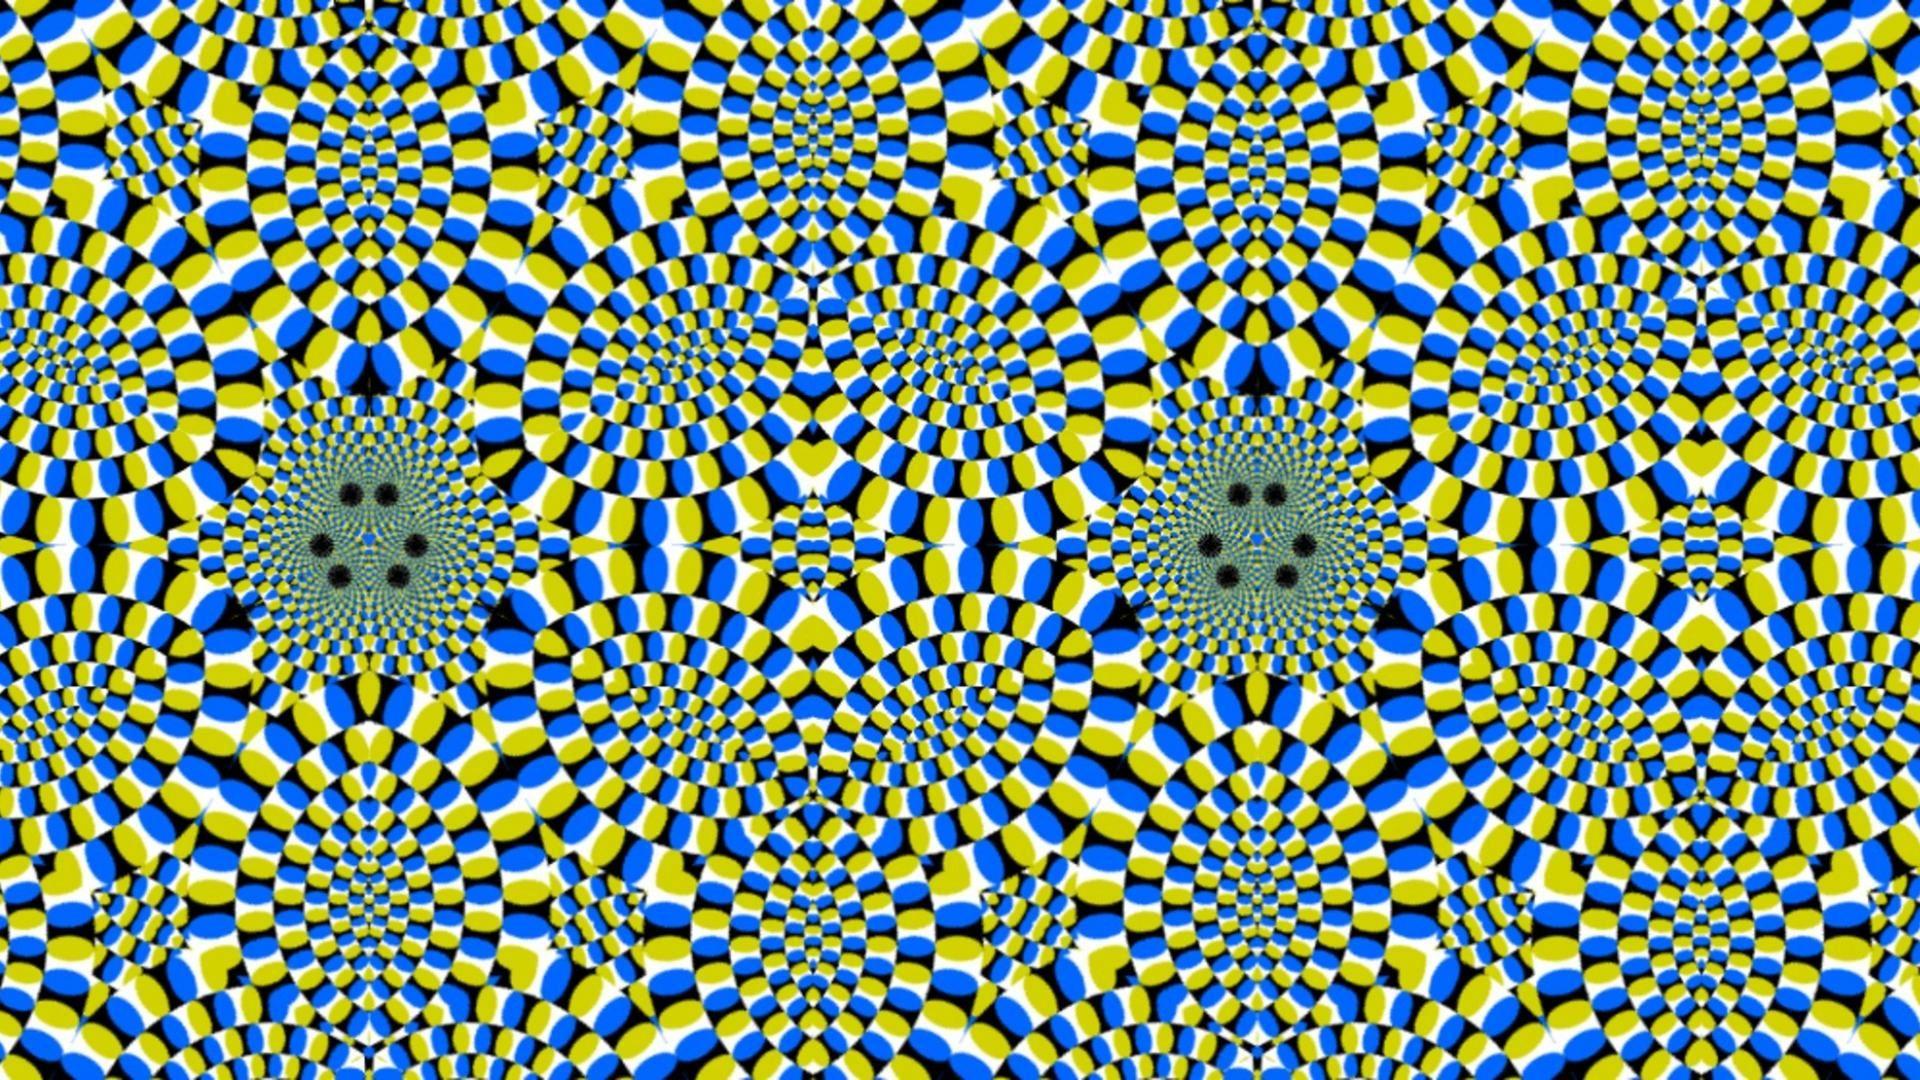 Free Optical Illusion Wallpaper Desktop | HD Wallpapers ...